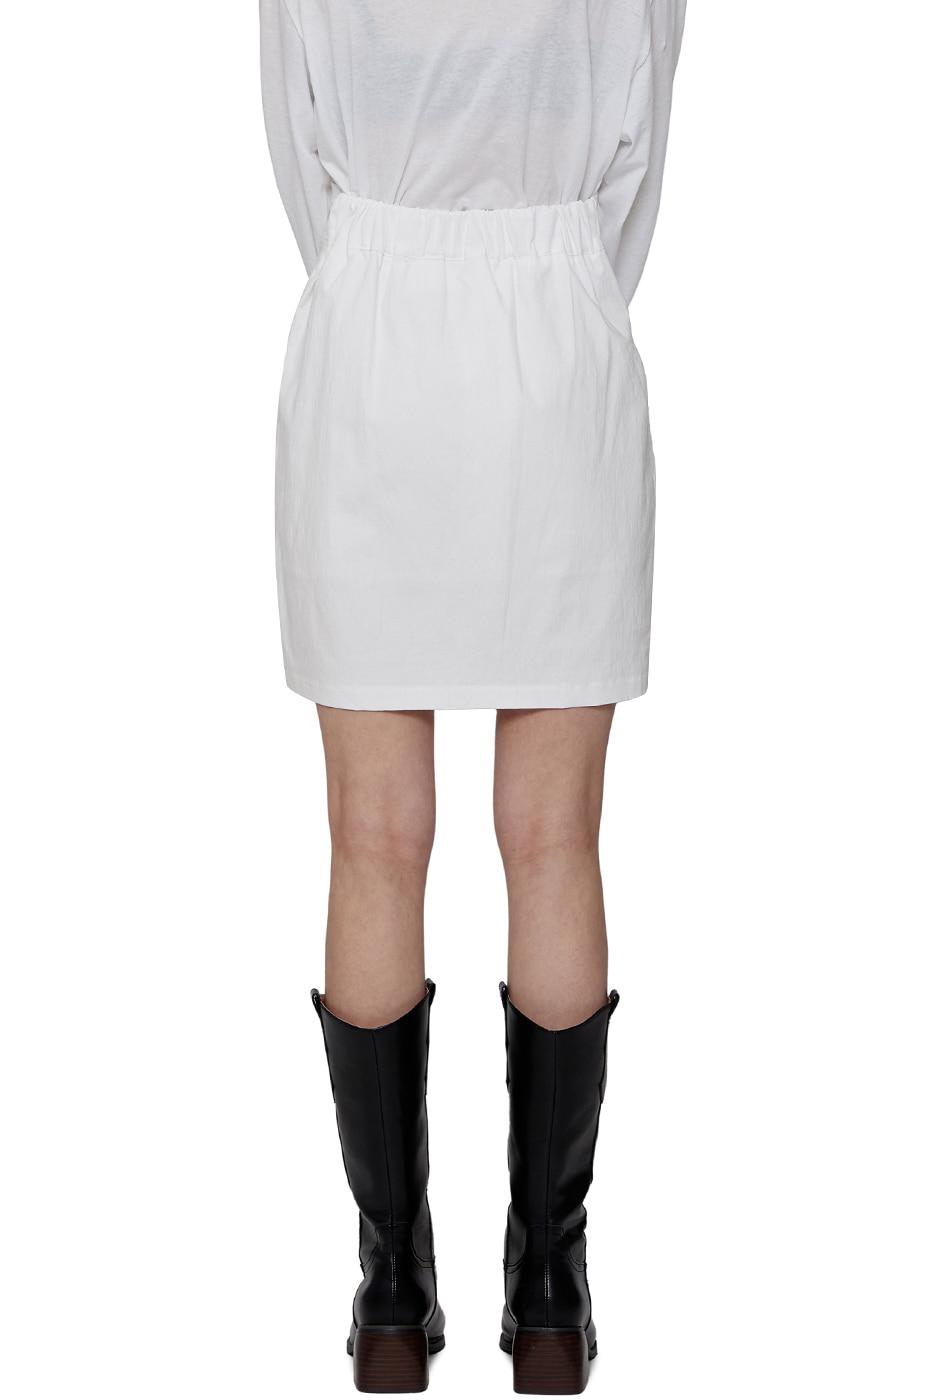 L Unfooted short skirt